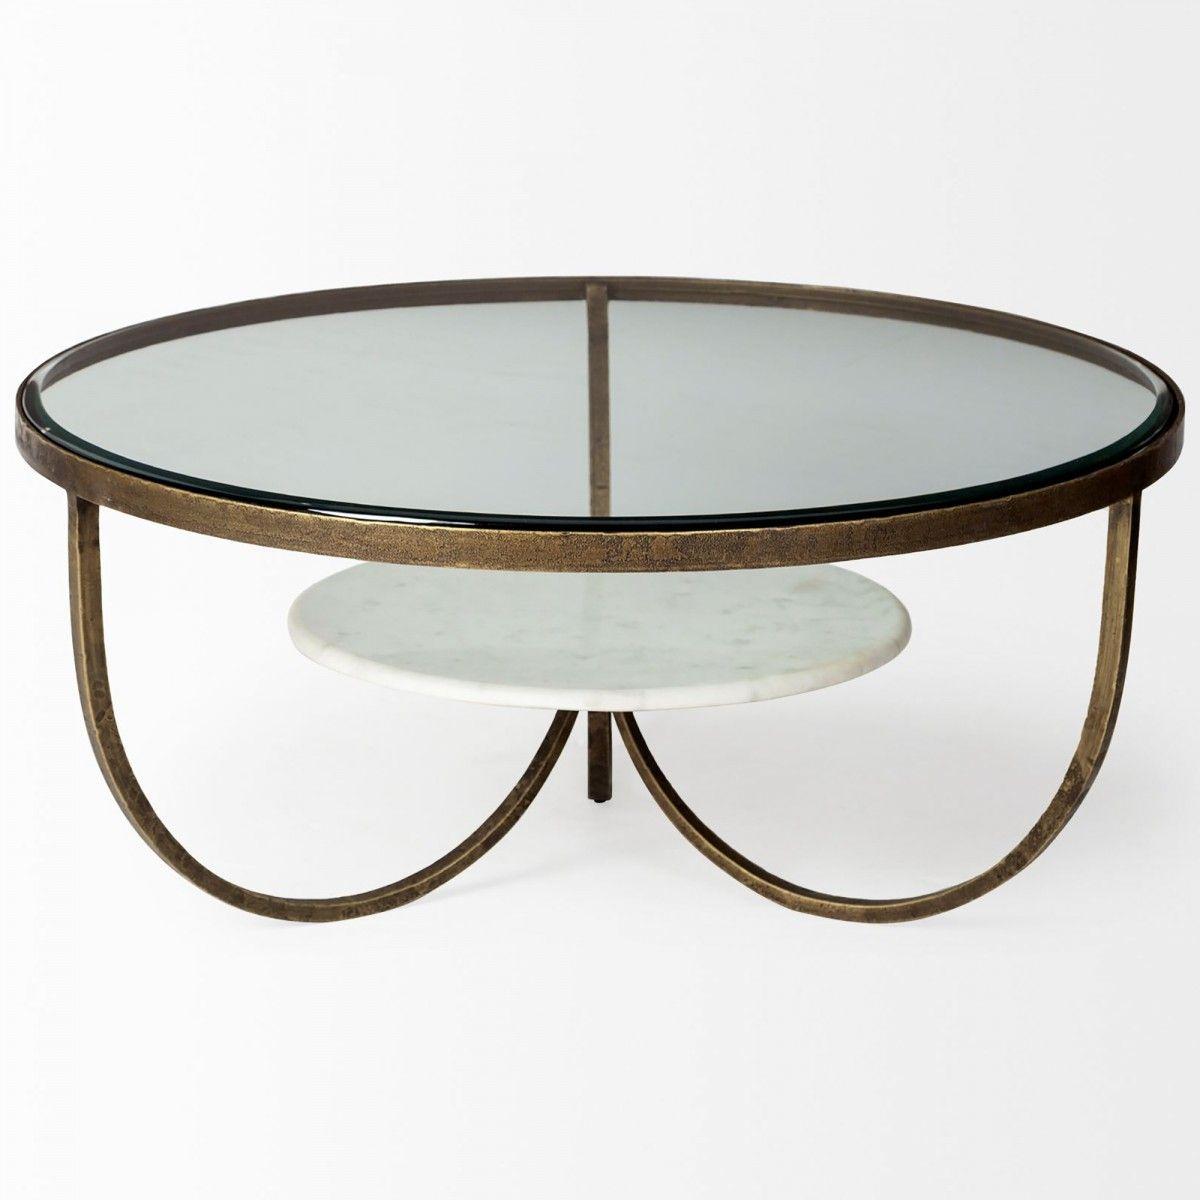 Candelabra Home Reinhardt I Coffee Table Coffee Table Coffee Table Frame Glass Coffee Table [ 1200 x 1200 Pixel ]